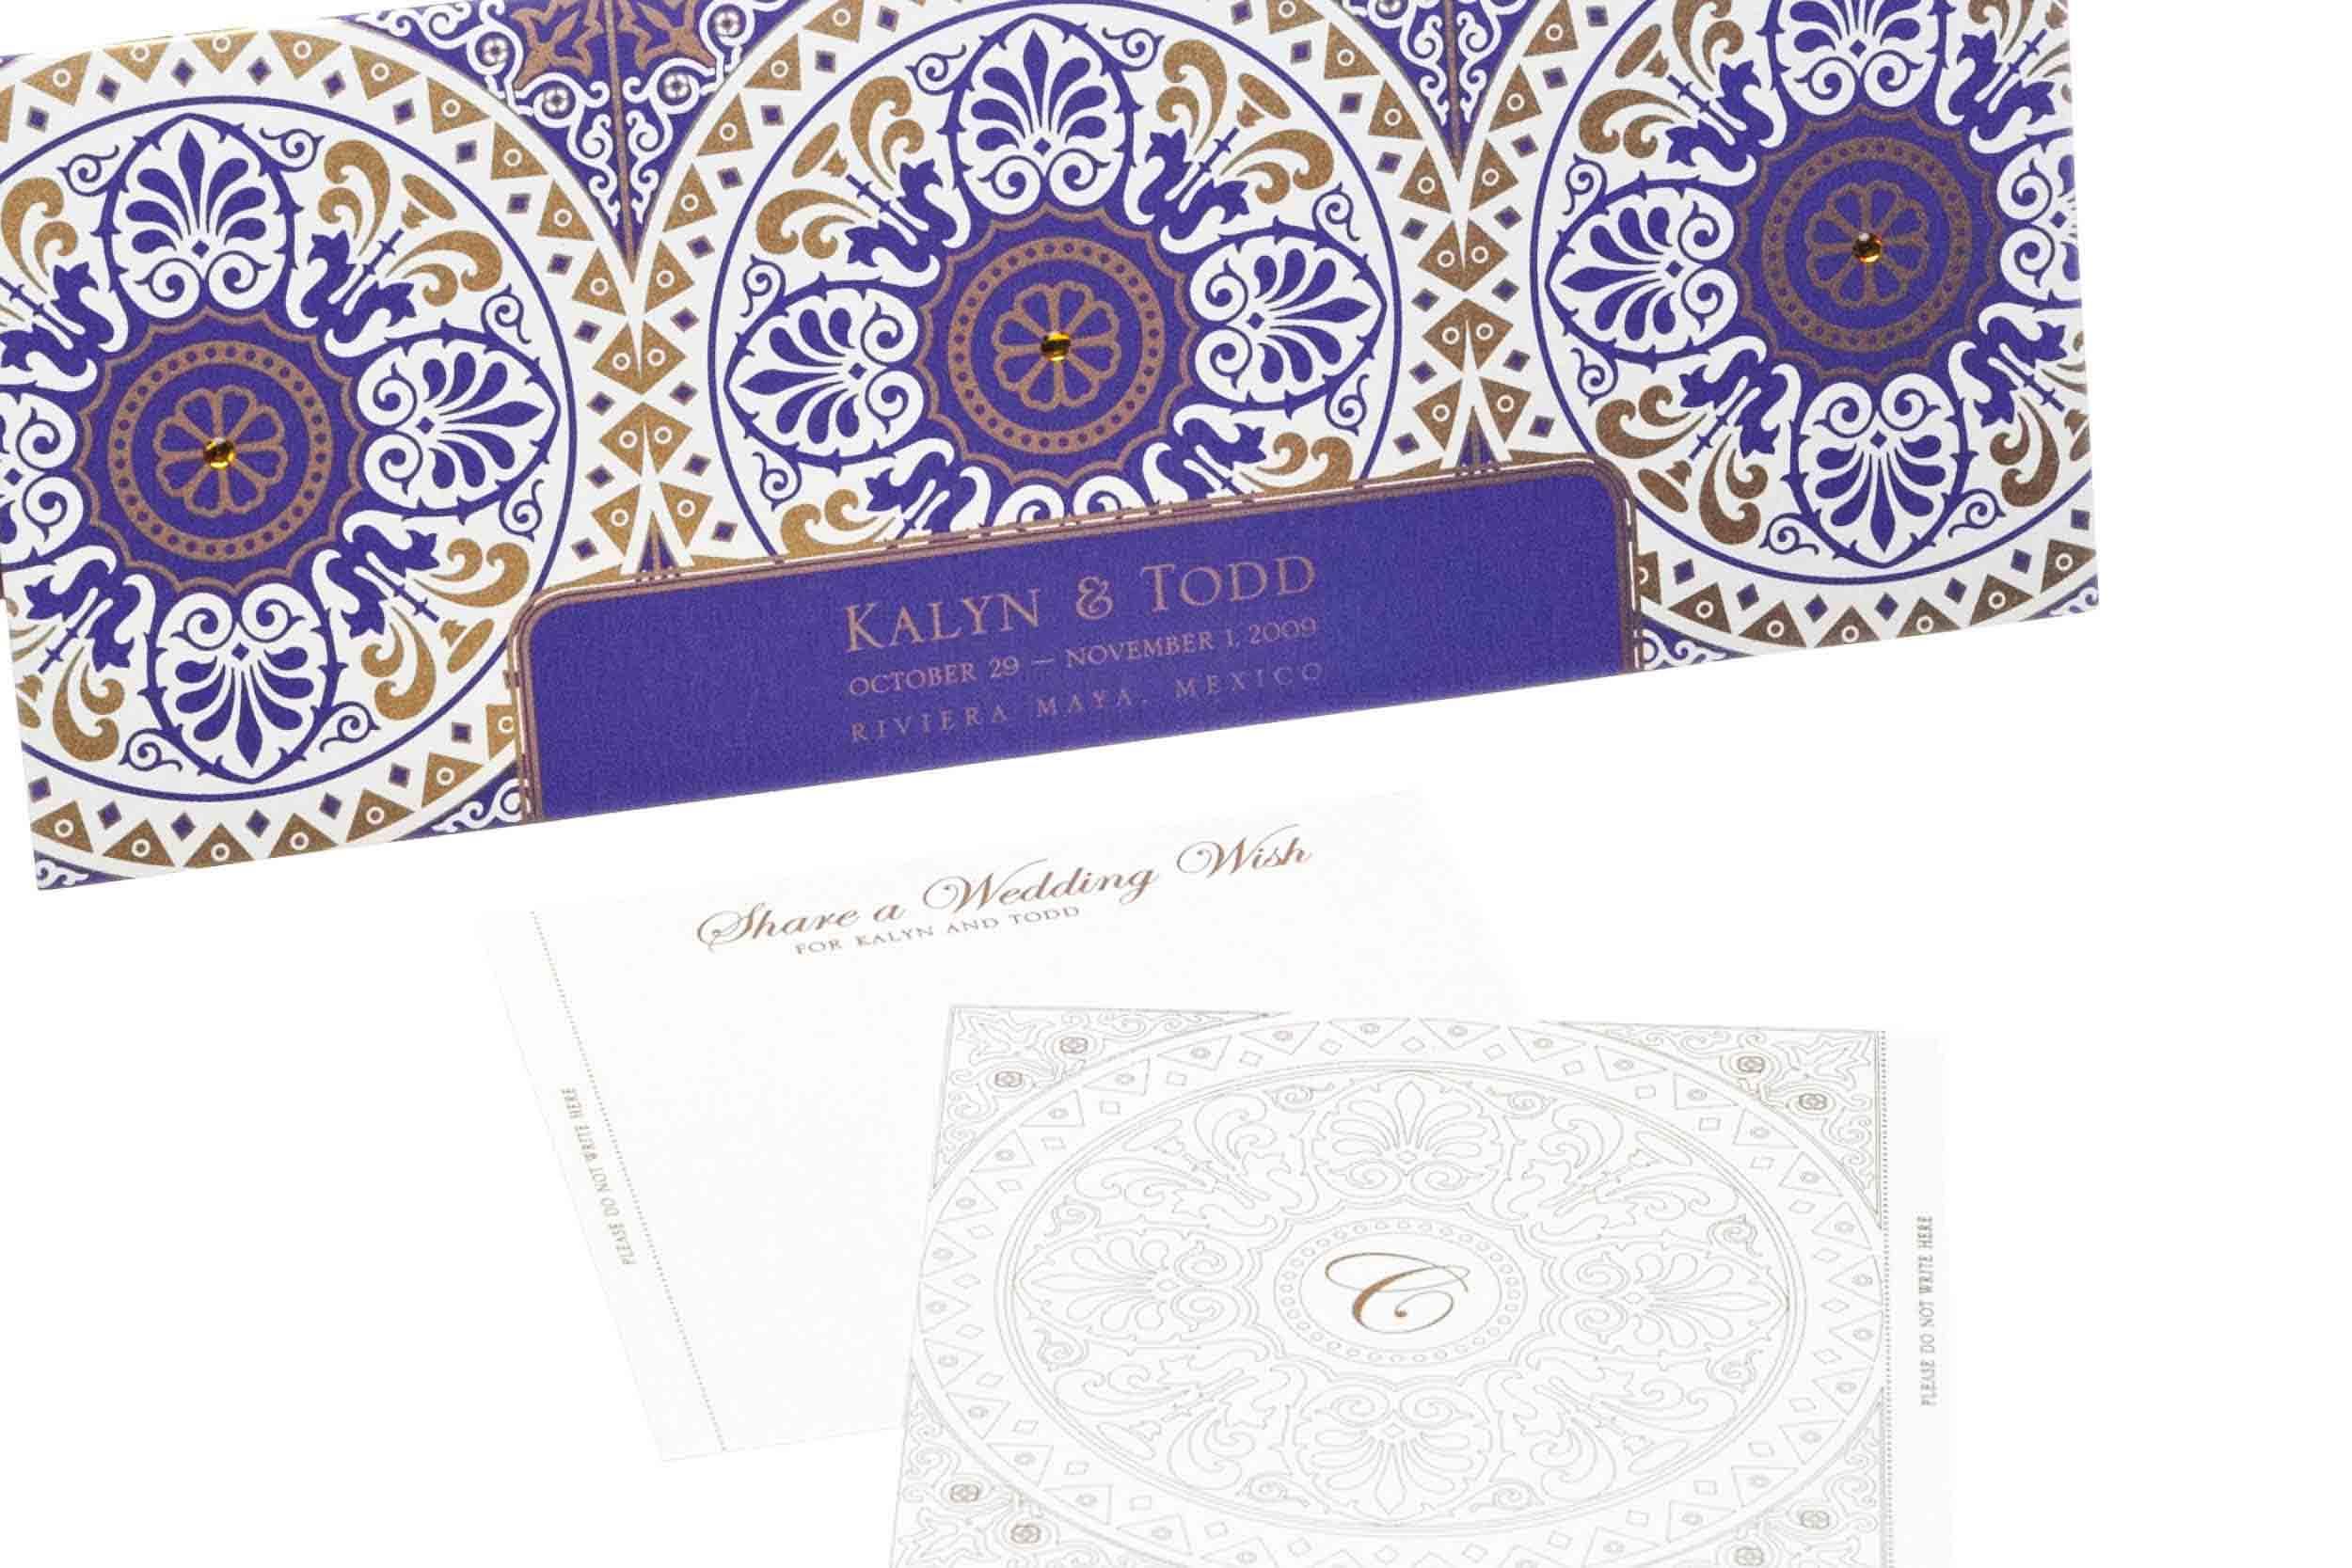 Exotica_bespoke wedding invite_ananyacards.com-02.jpg